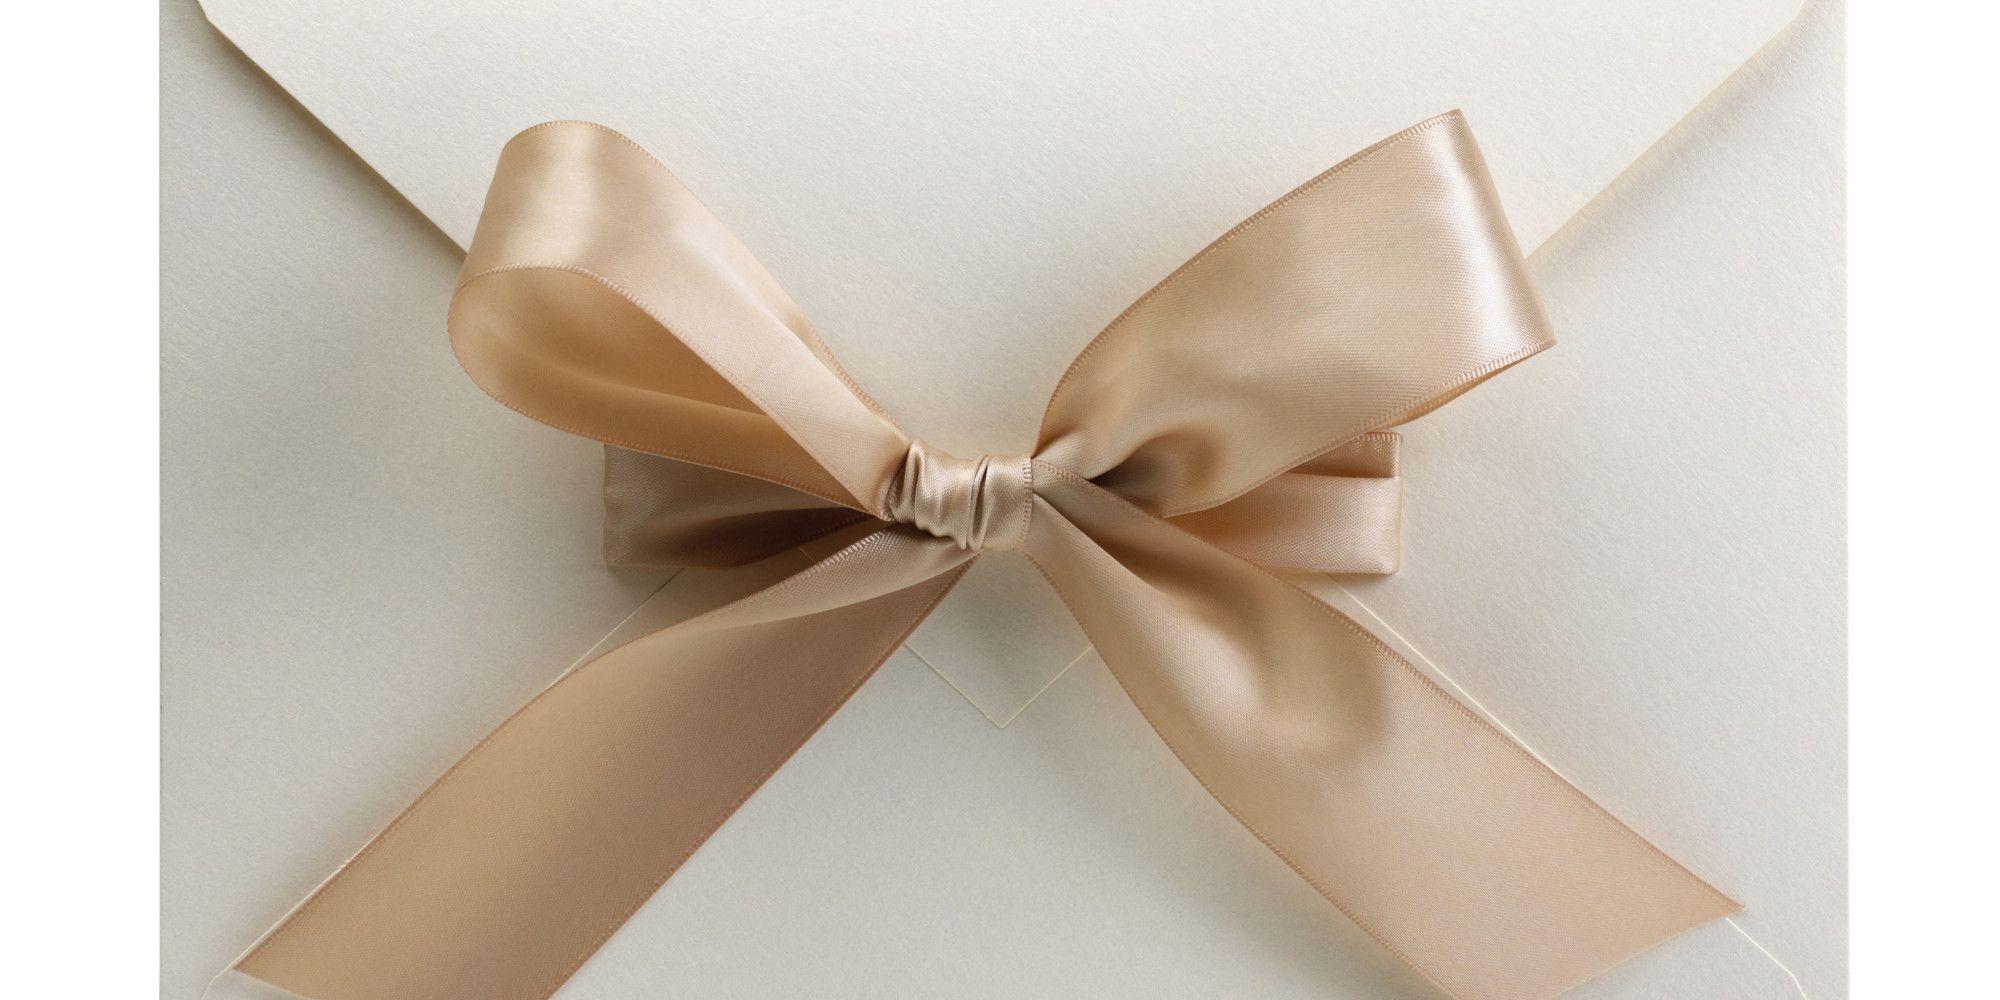 Diy wedding invitation ideas for the crafty bride and groom